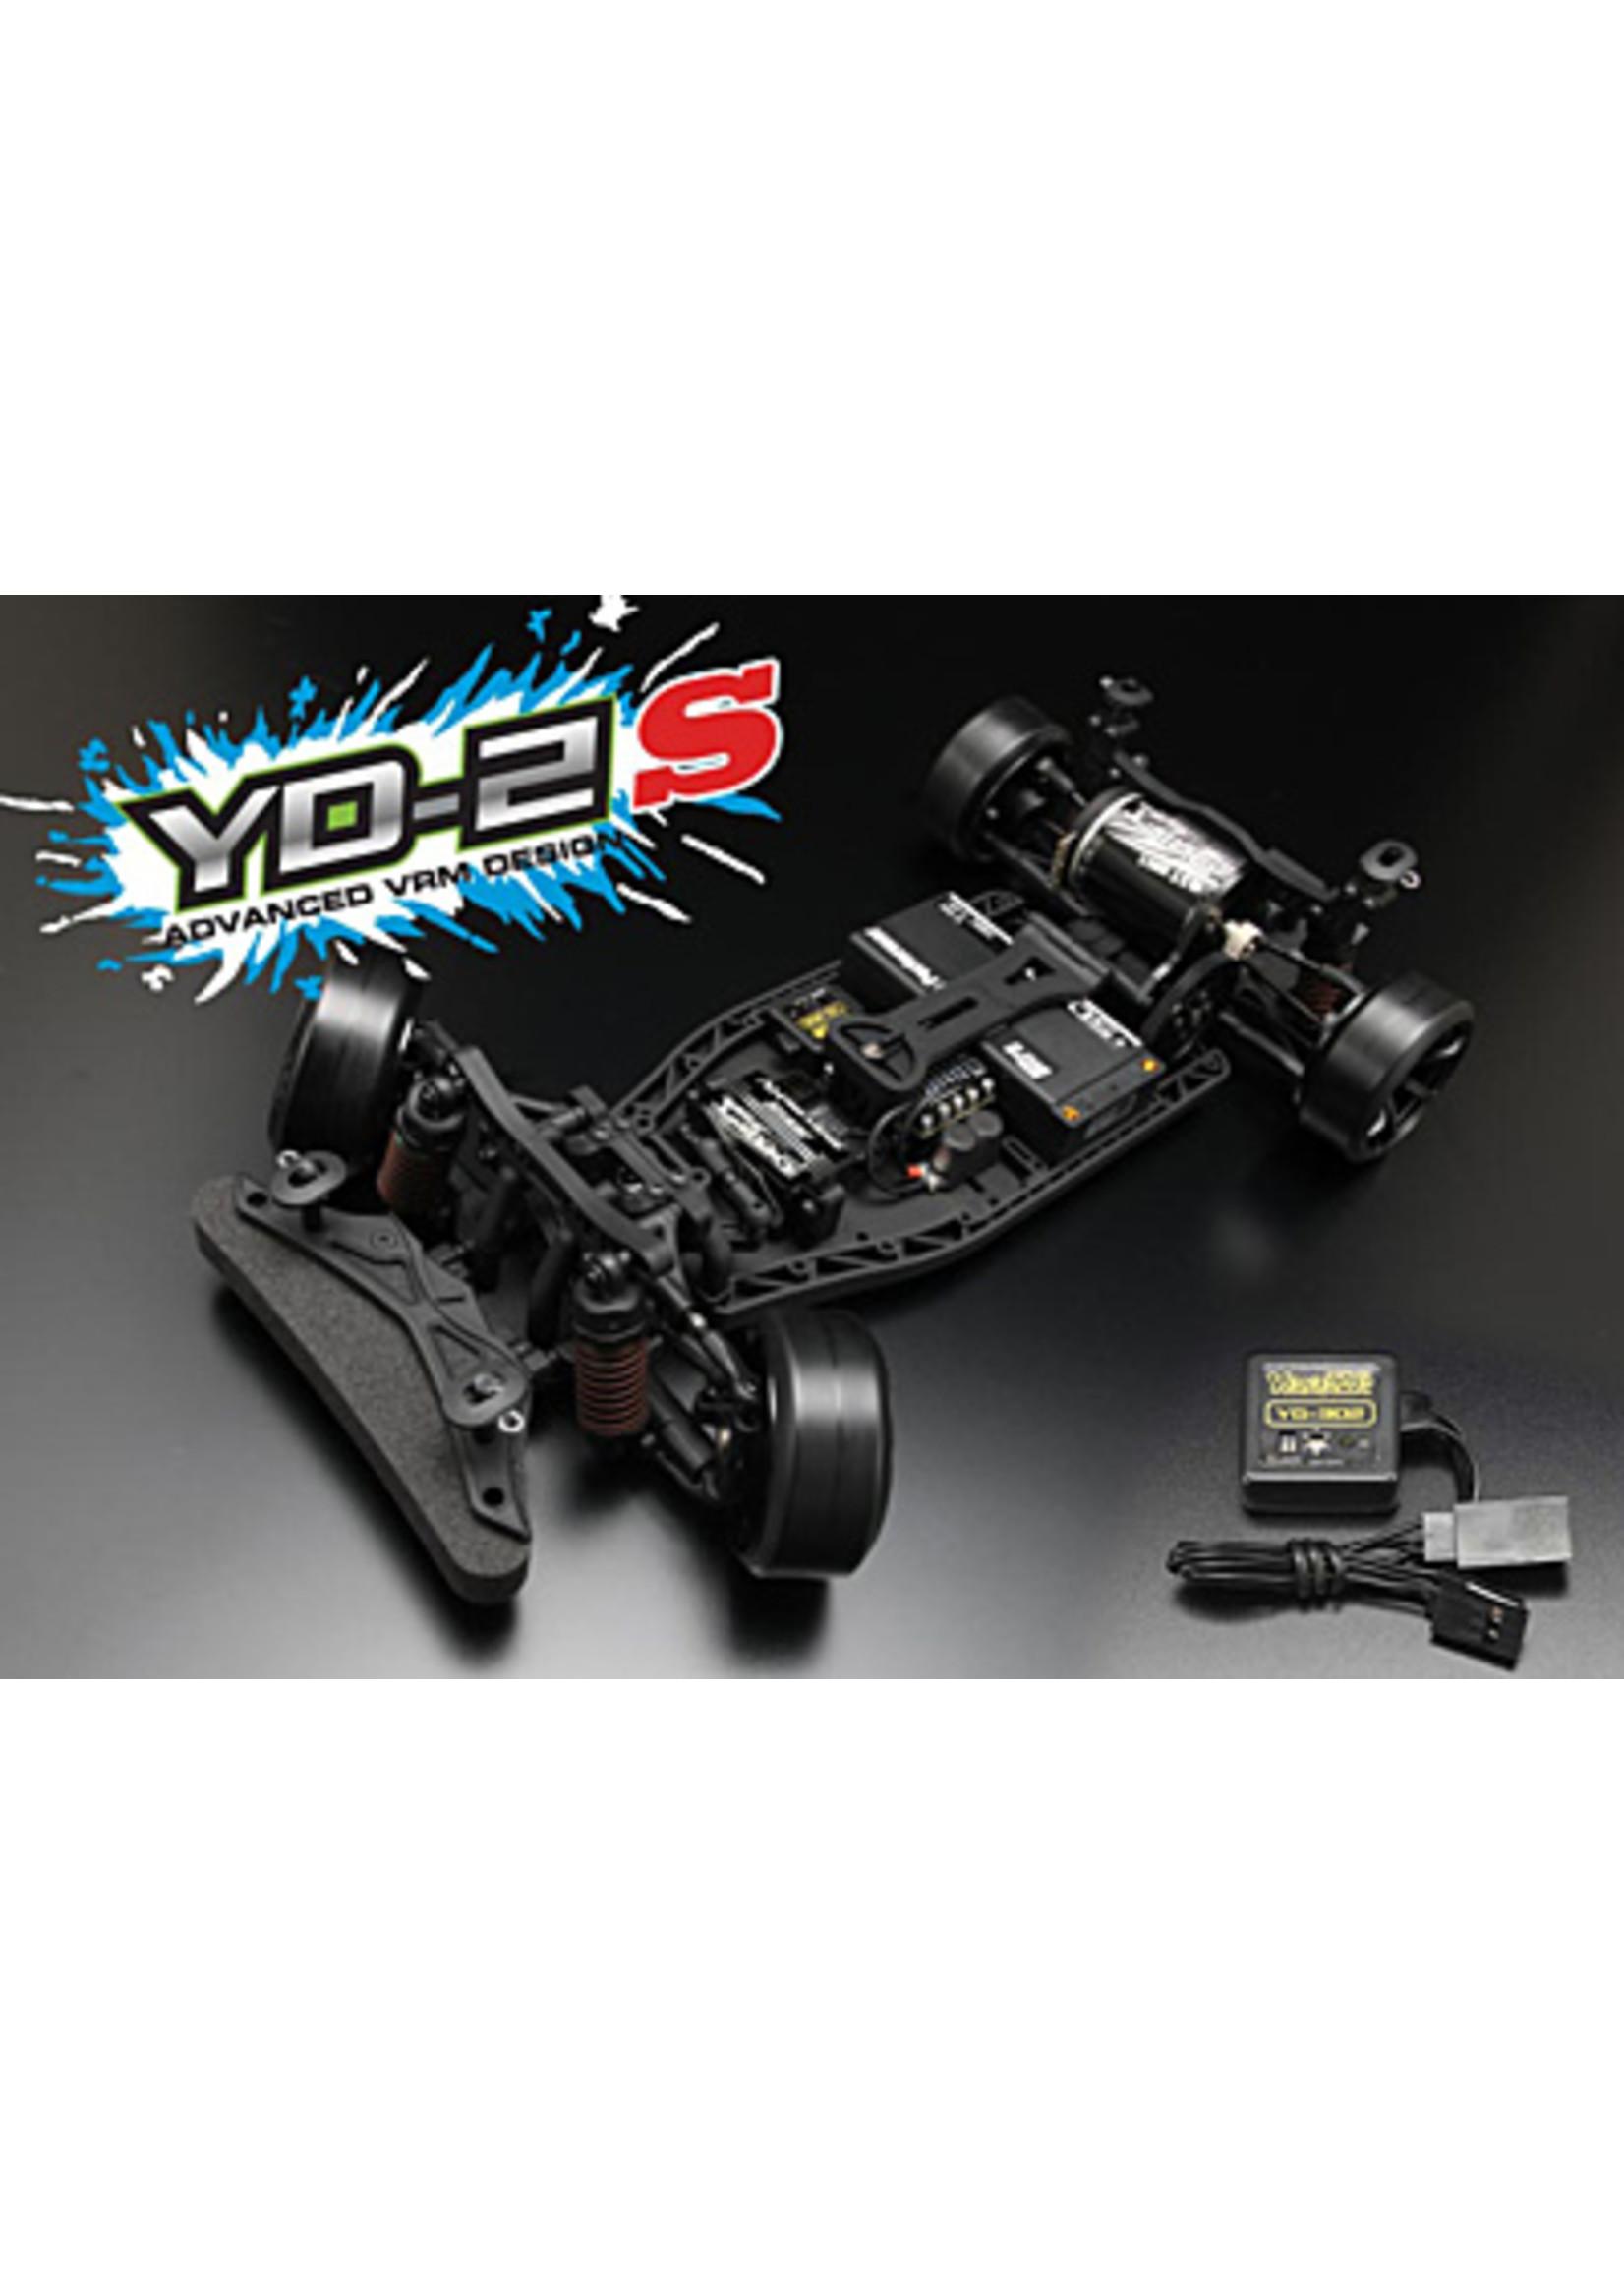 Yokomo Yokomo YD-2S RWD Drift Car Kit (Plastic Chassis with YG-302 Steering Gyro) DP-YD2SG